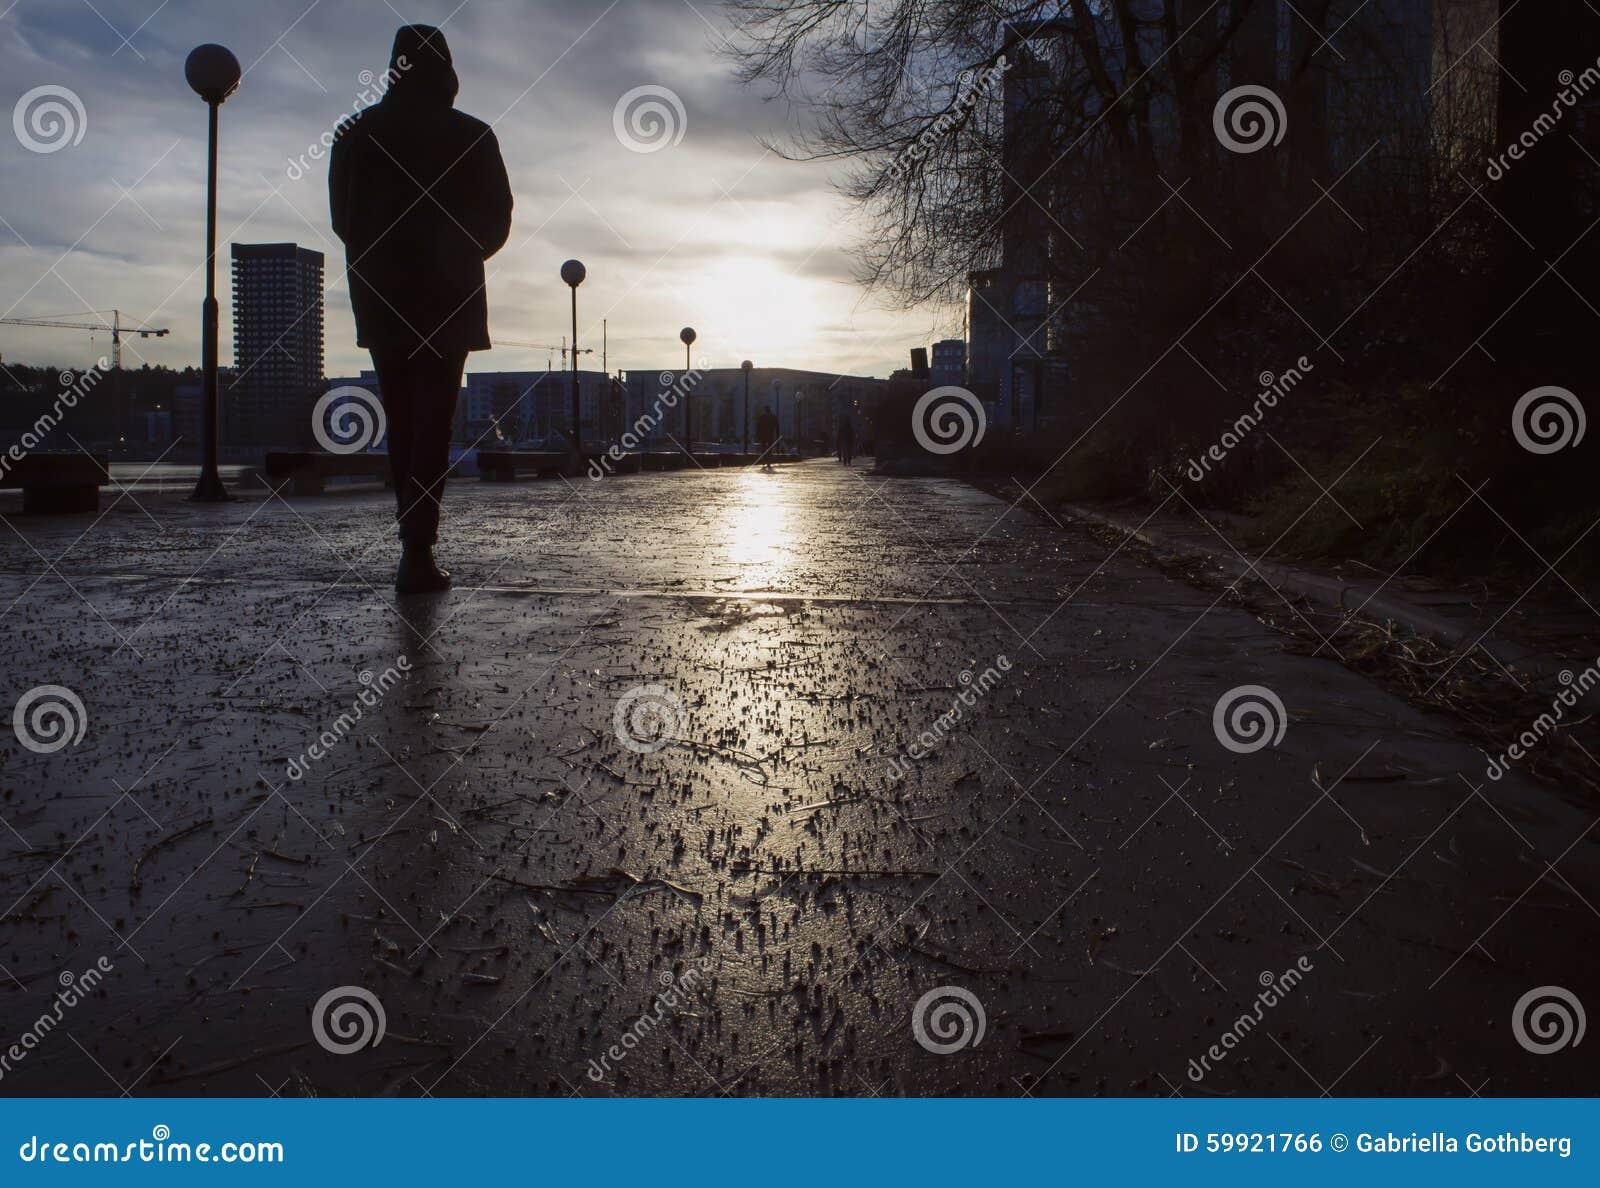 Silohouette του ατόμου που περπατά σε μια υγρή οδό μια θλιβερή ημέρα στα τέλη του φθινοπώρου/το χειμώνα,